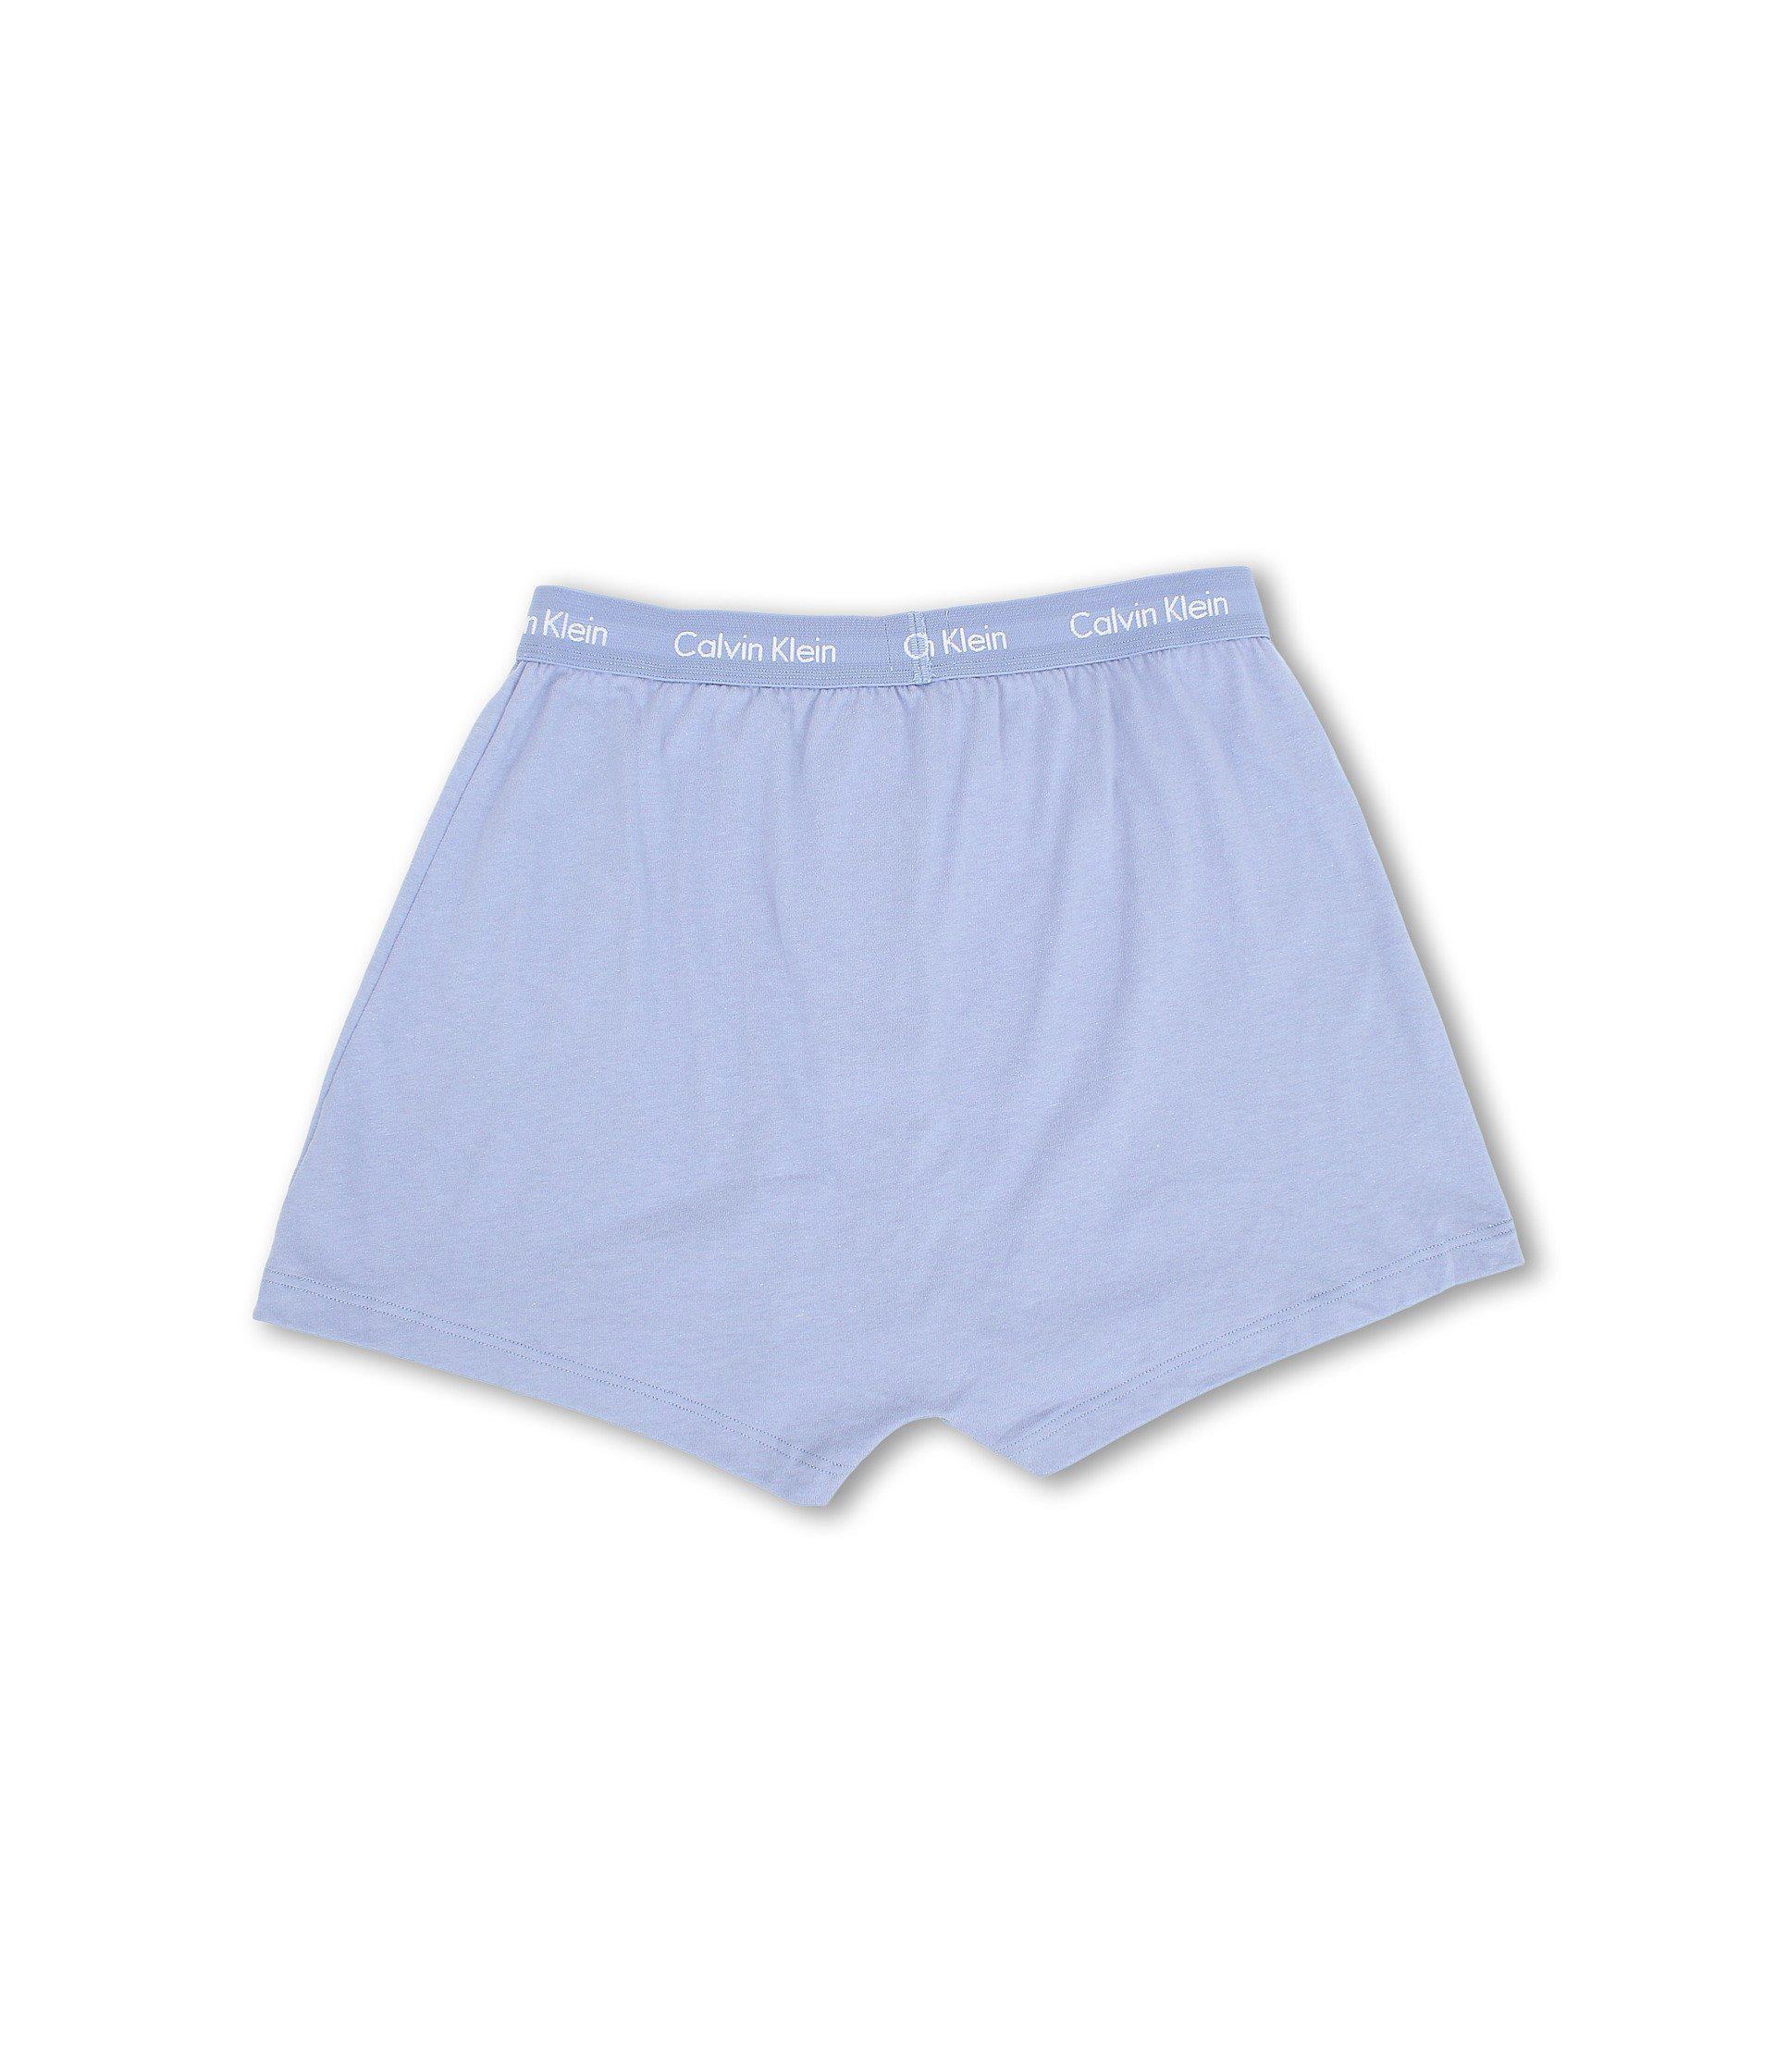 65252dc710 Lyst - Calvin Klein Cotton Classic Knit Boxer 3-pack Nu3040 (black) Men s  Underwear in Blue for Men